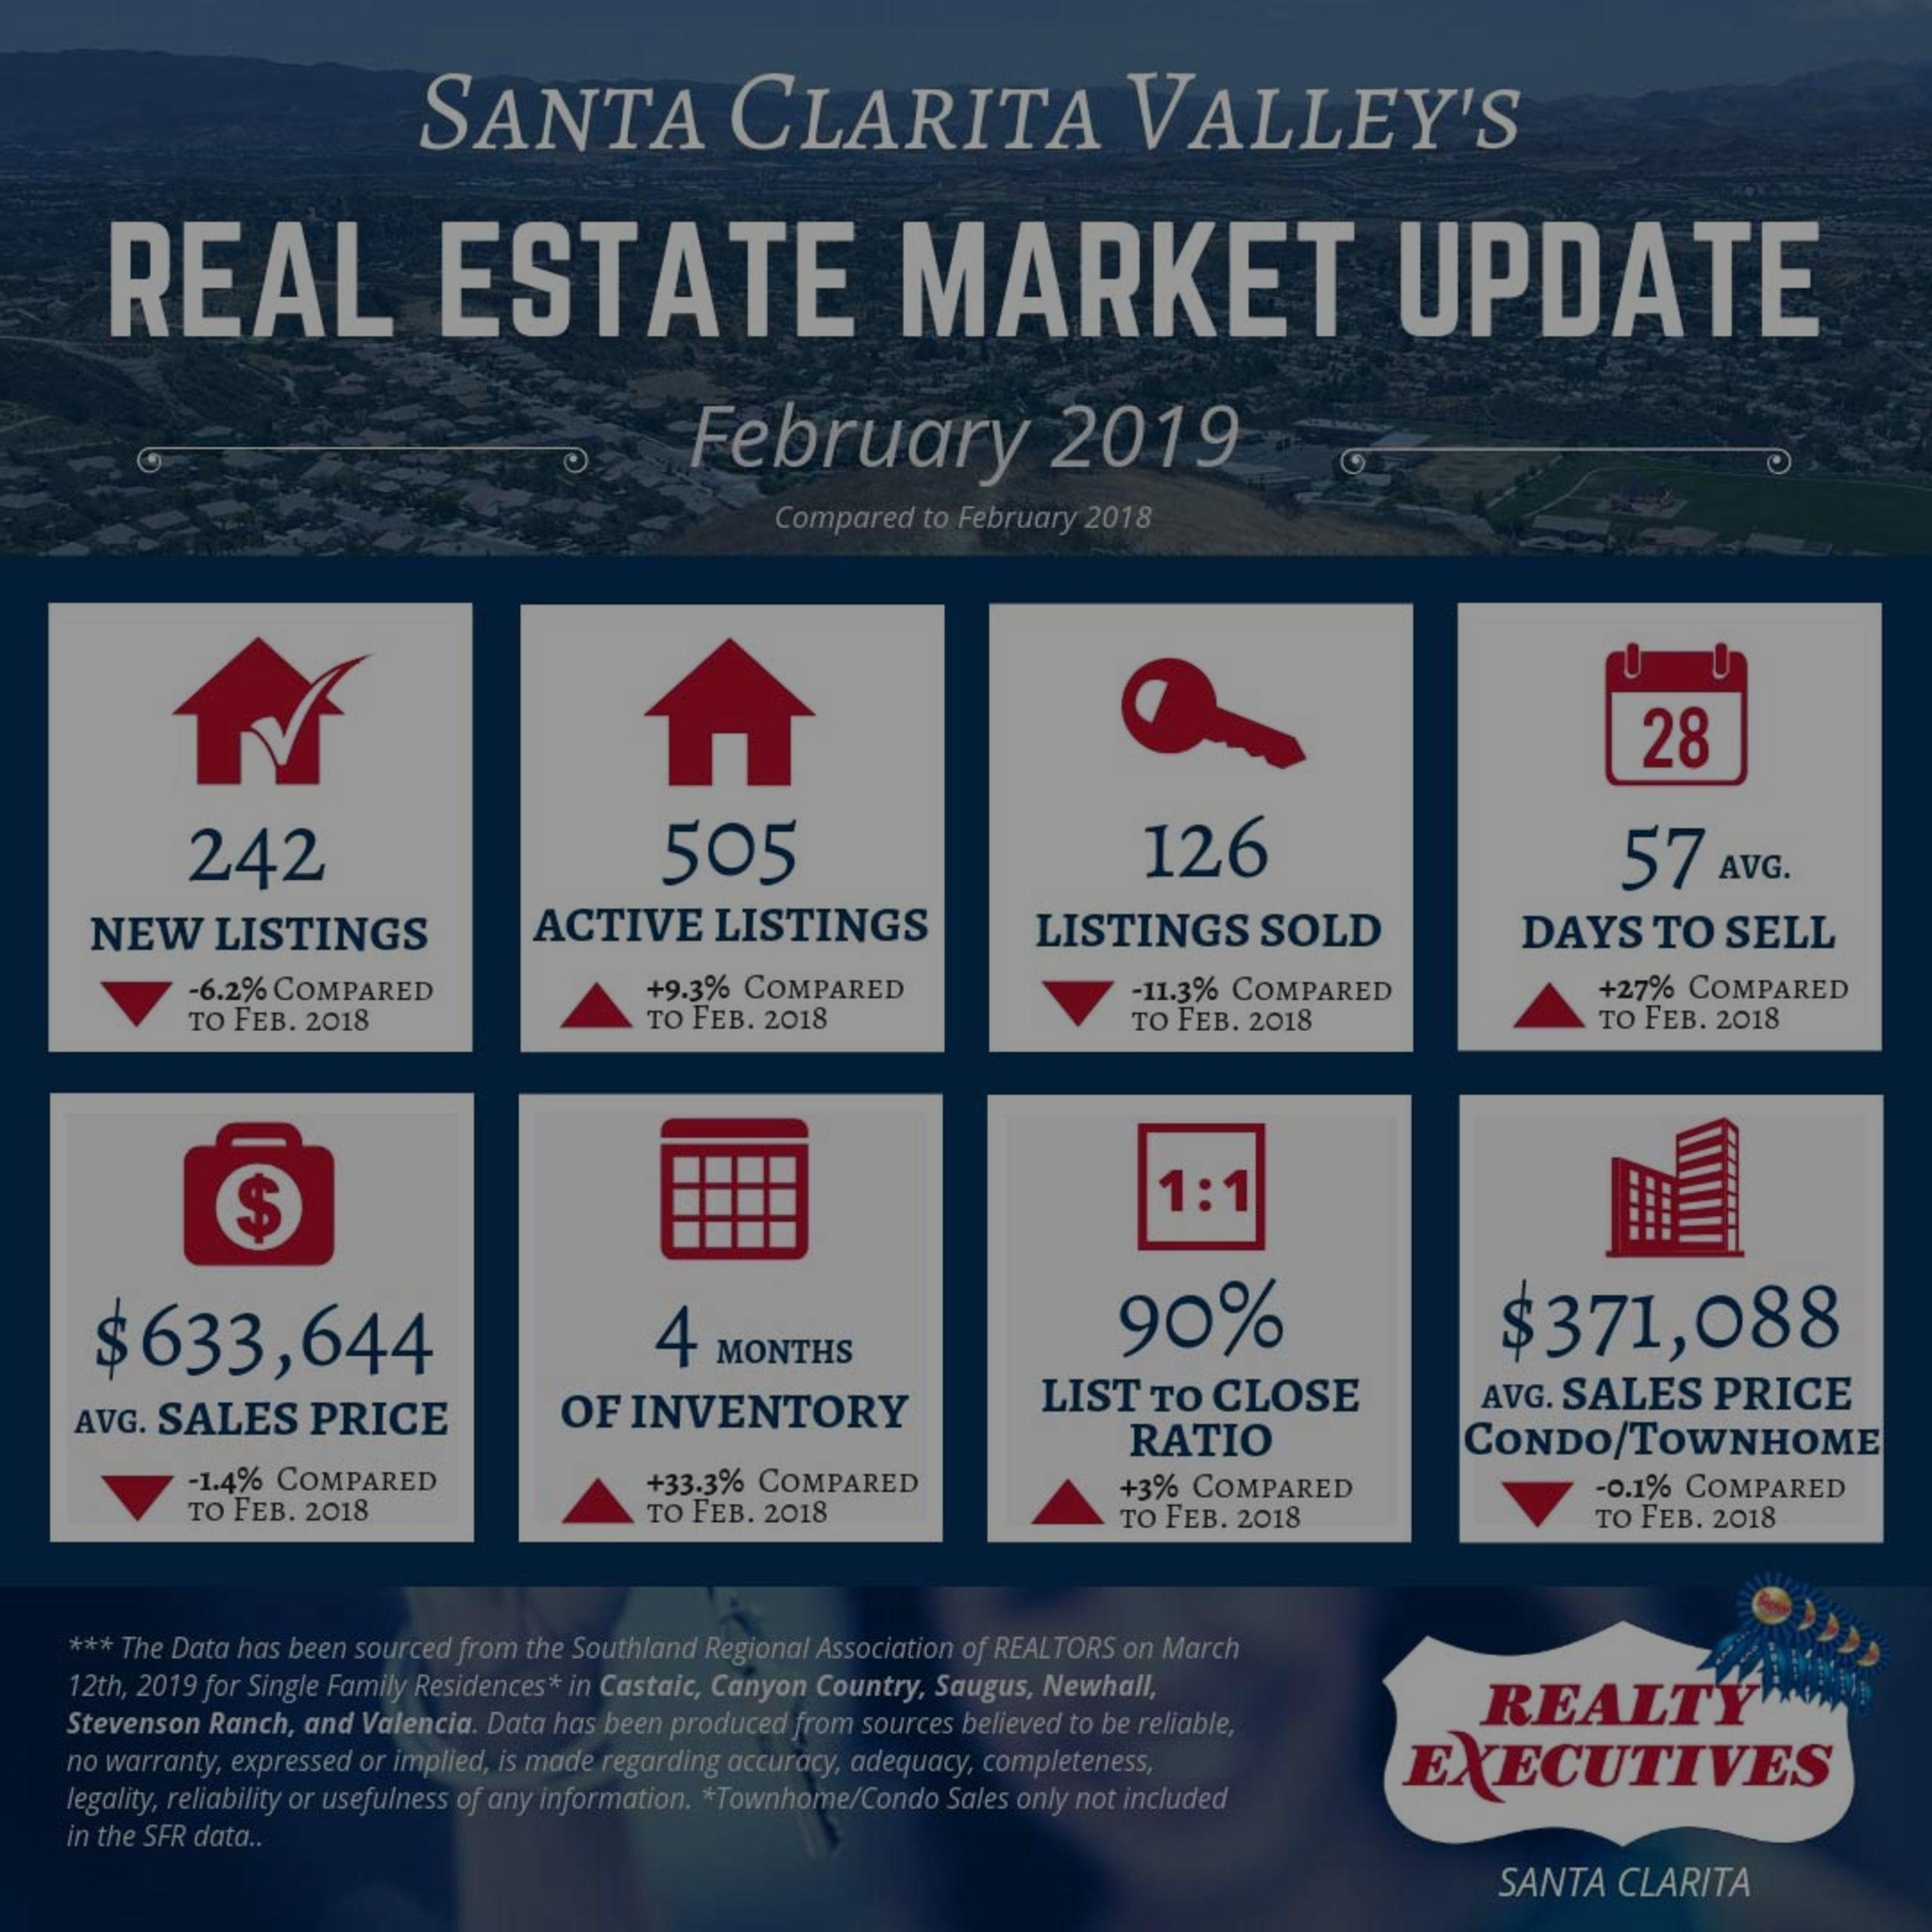 February 2019: Santa Clarita Valley Real Estate Market Update